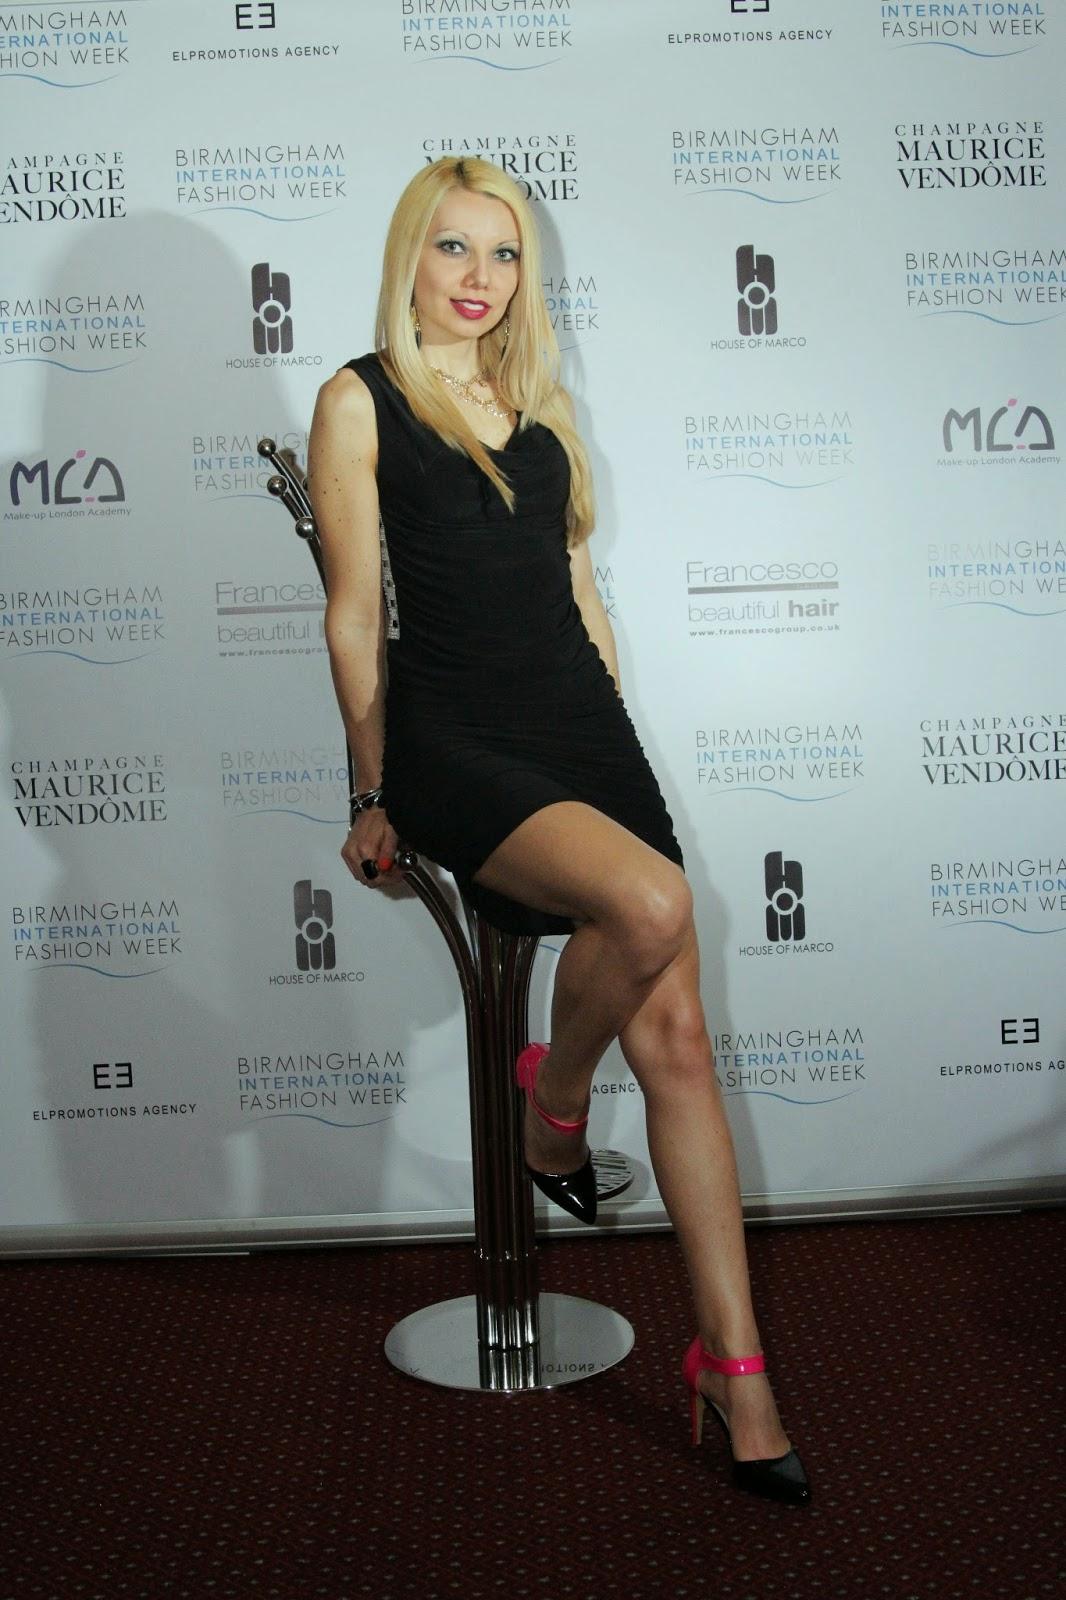 Designer Khloe Nova at BHMFW 2014